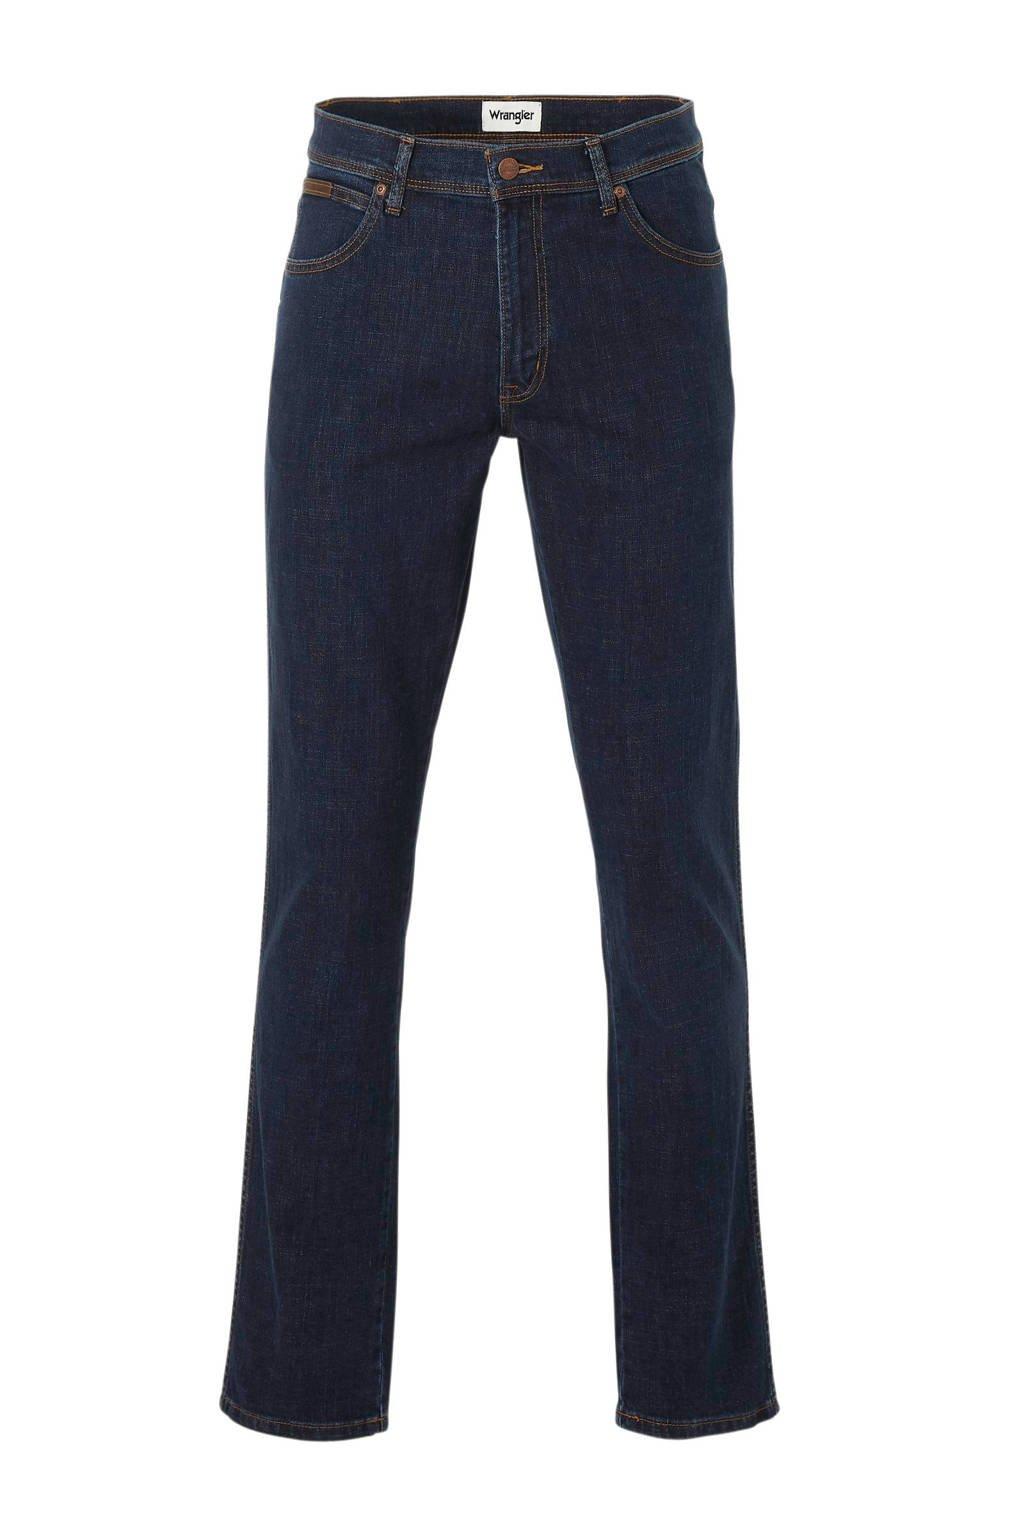 Wrangler slim fit jeans Texas cross game, CROSS GAME